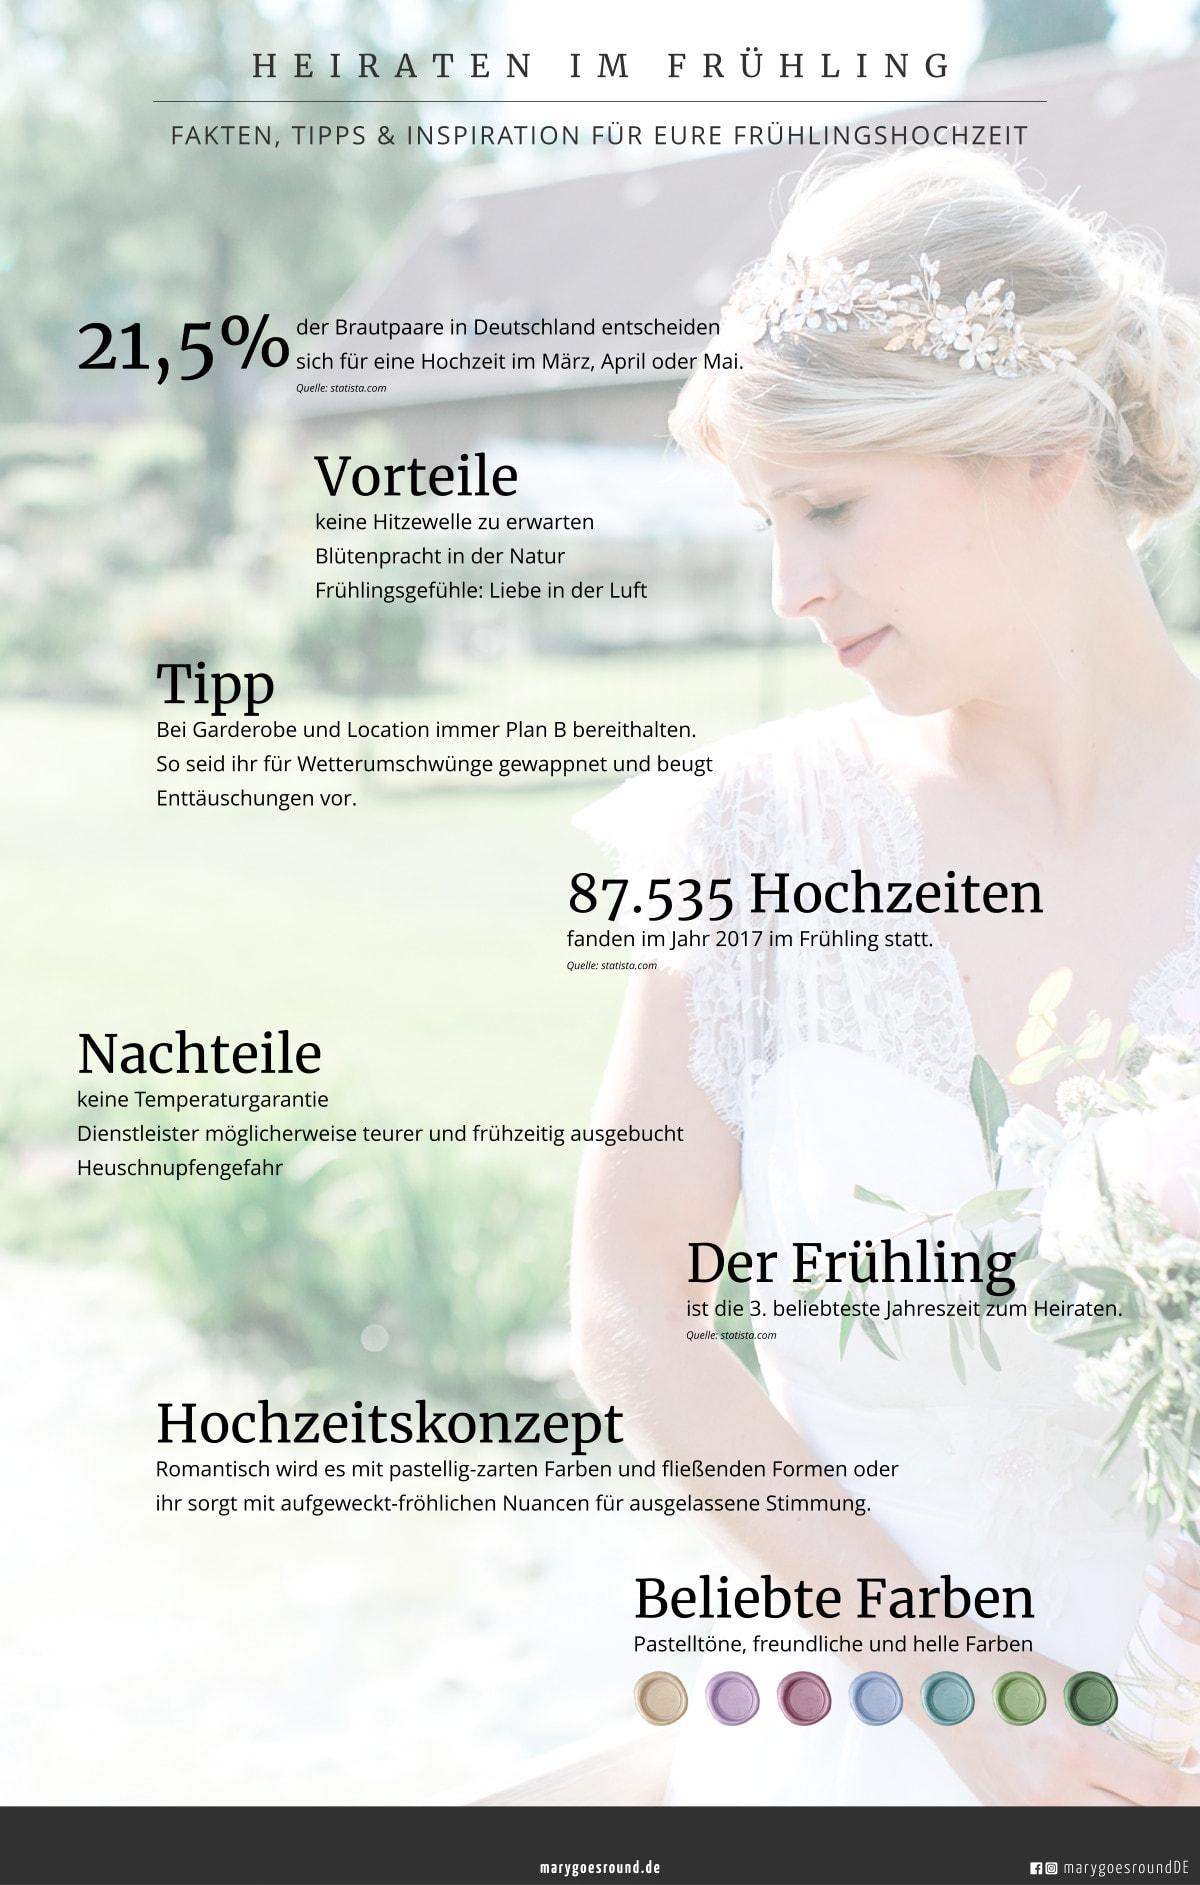 "Blogserie ""Hochzeit 4 Stagioni"": Heiraten im Frühling, Infografik | marygoesround®"